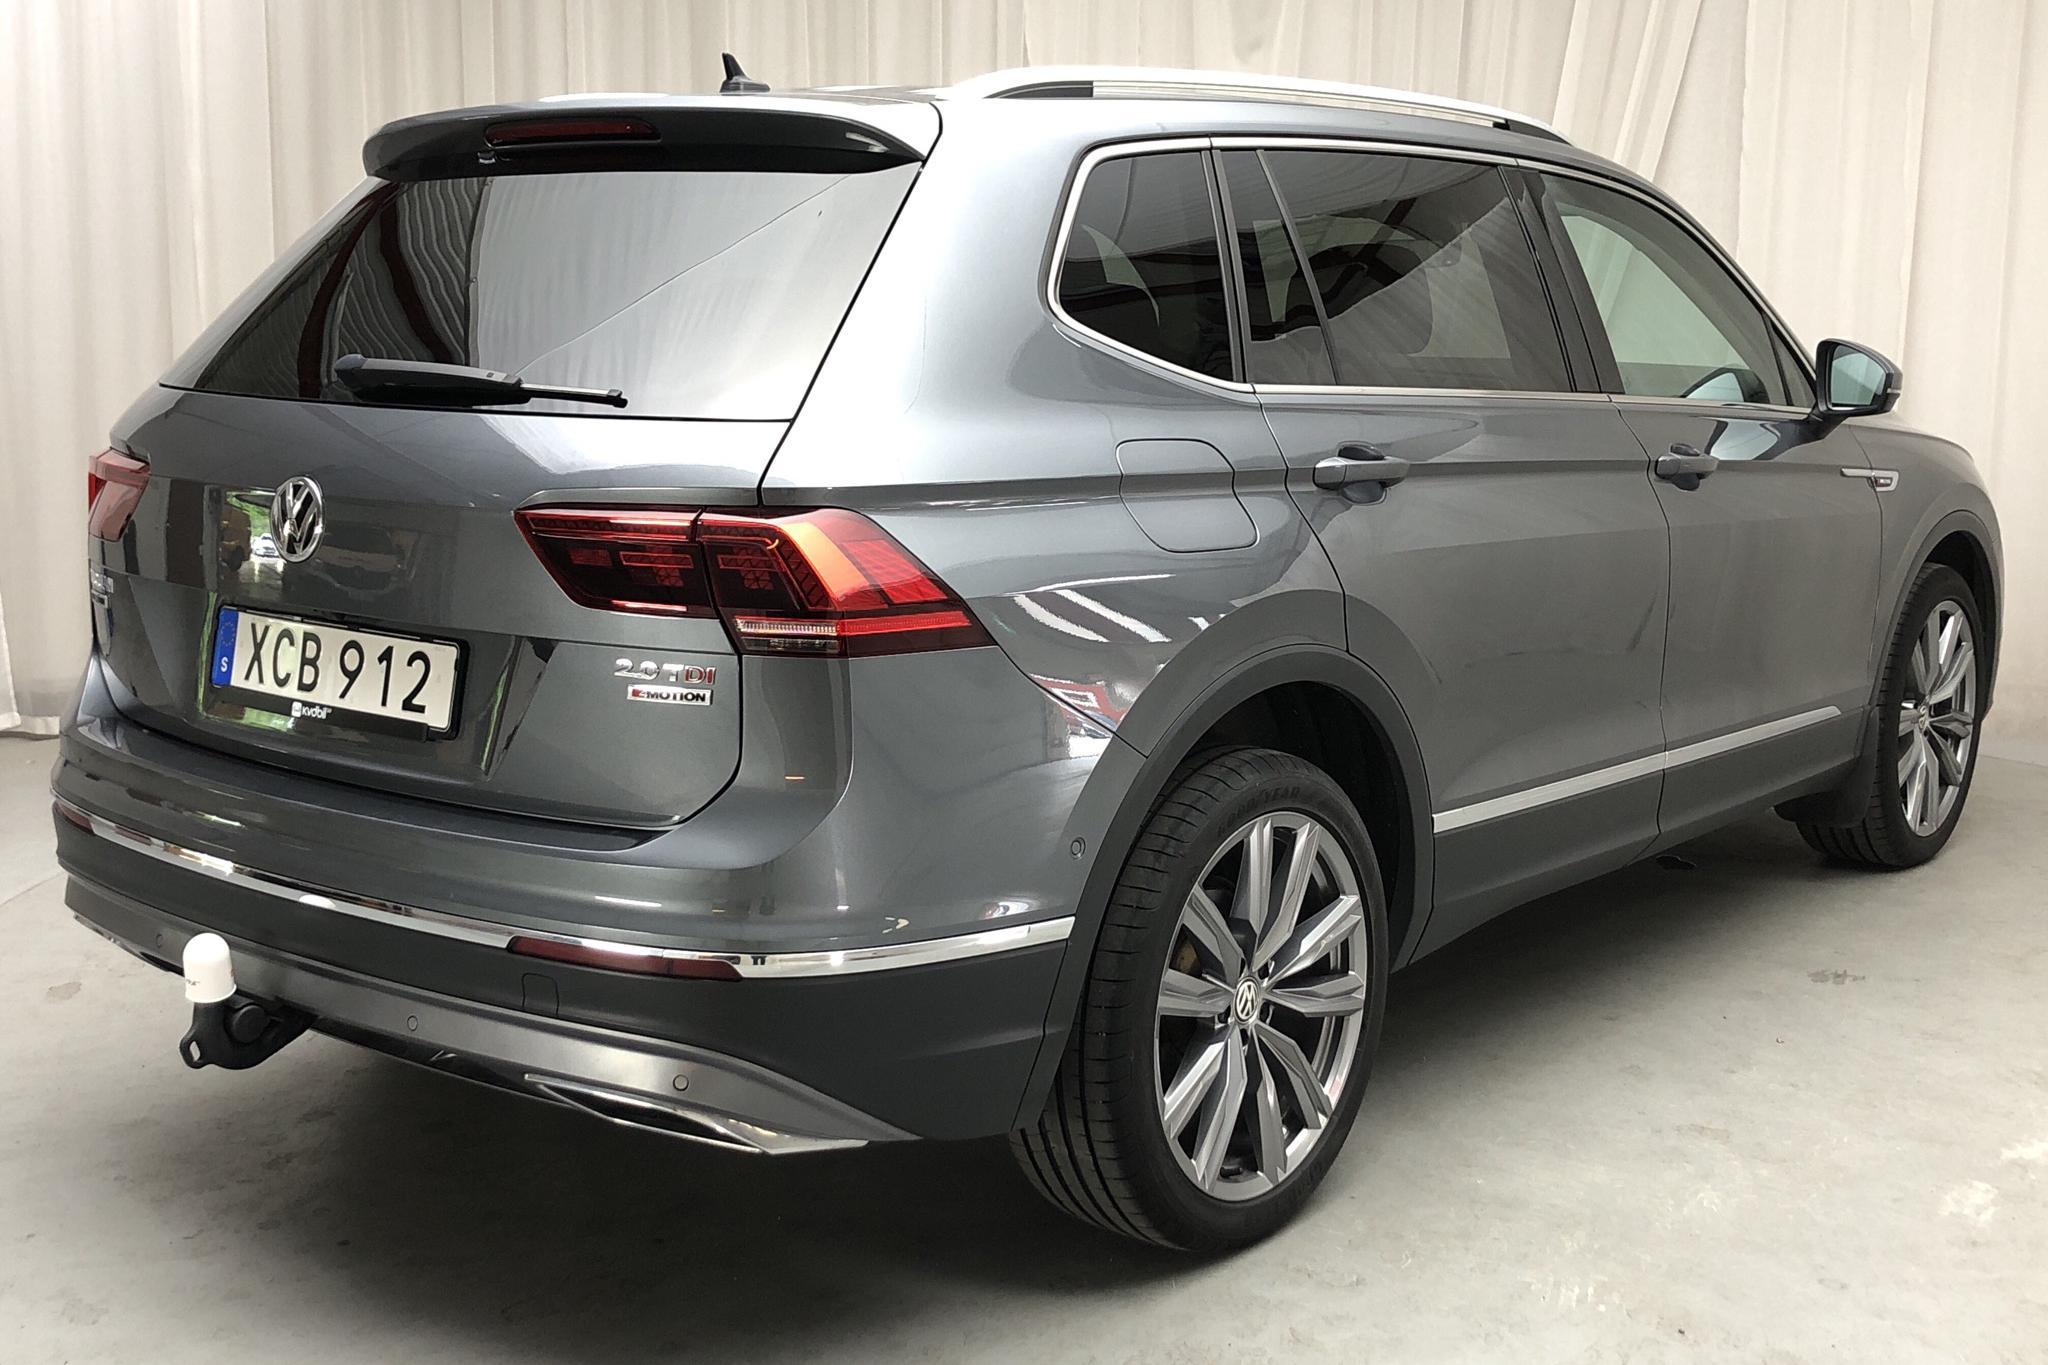 VW Tiguan 2.0 TDI 4MOTION (190hk) - 91 110 km - Automatic - Dark Grey - 2018